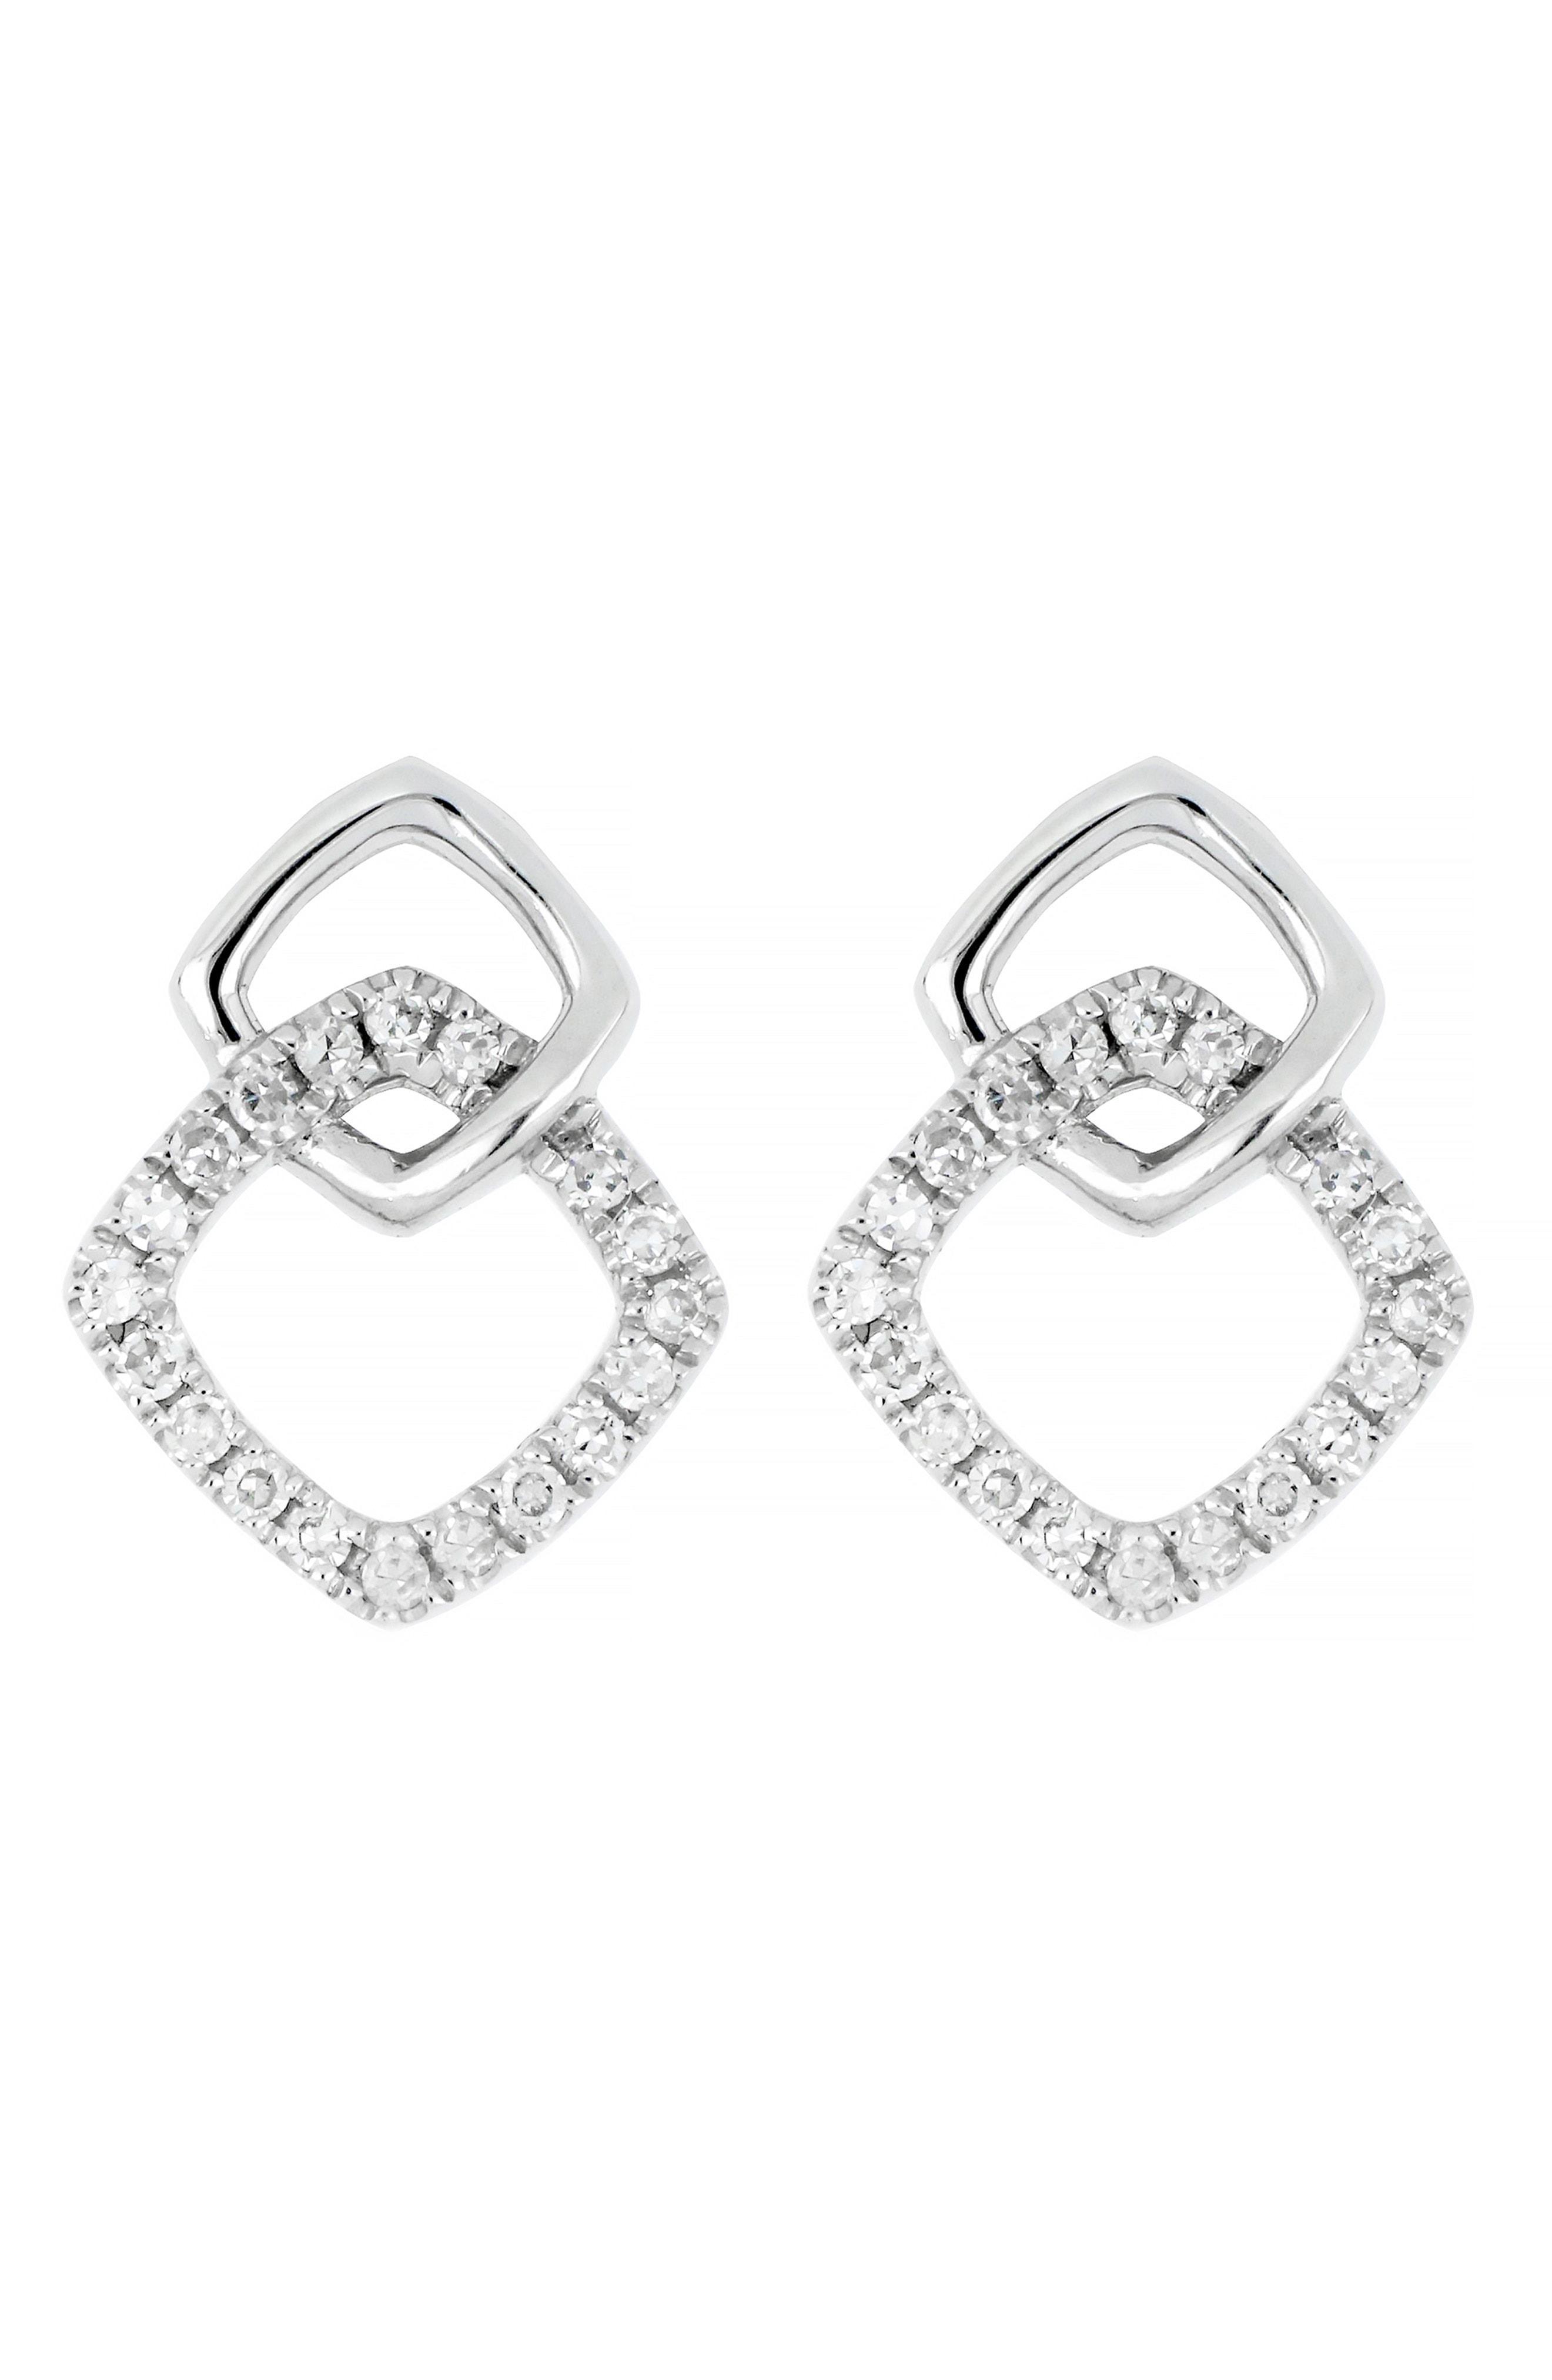 7c8ead2cd CARRIERE JEWELRY. Women's Metallic Carriere Double Square Earrings ...